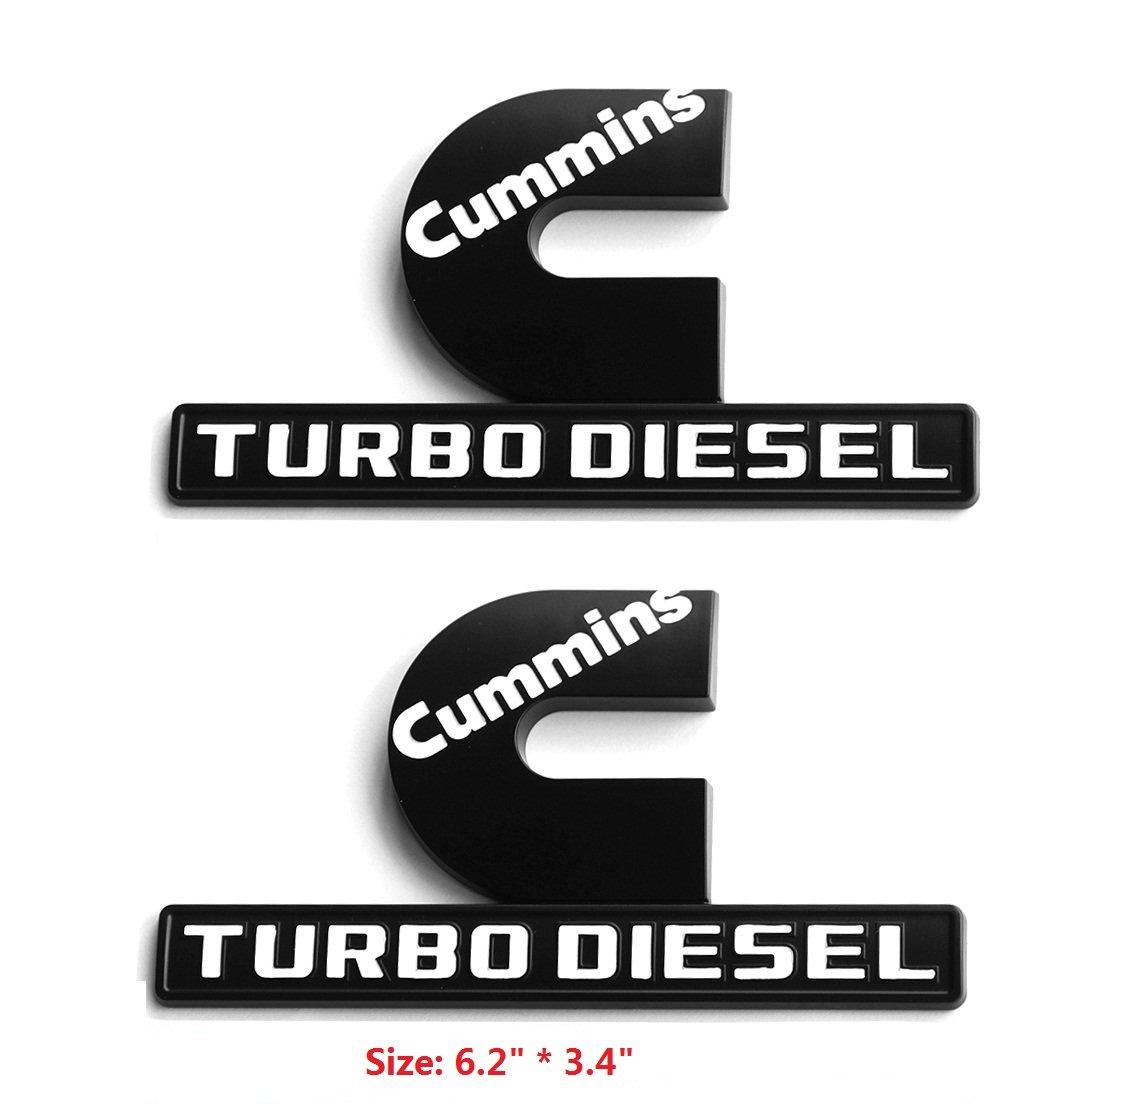 Yoaoo 2x OEM Black Dodge Cummins Turbo Diesel Emblem Badge for RAM 2500 3500 Fender Emblem Matte White 68216931